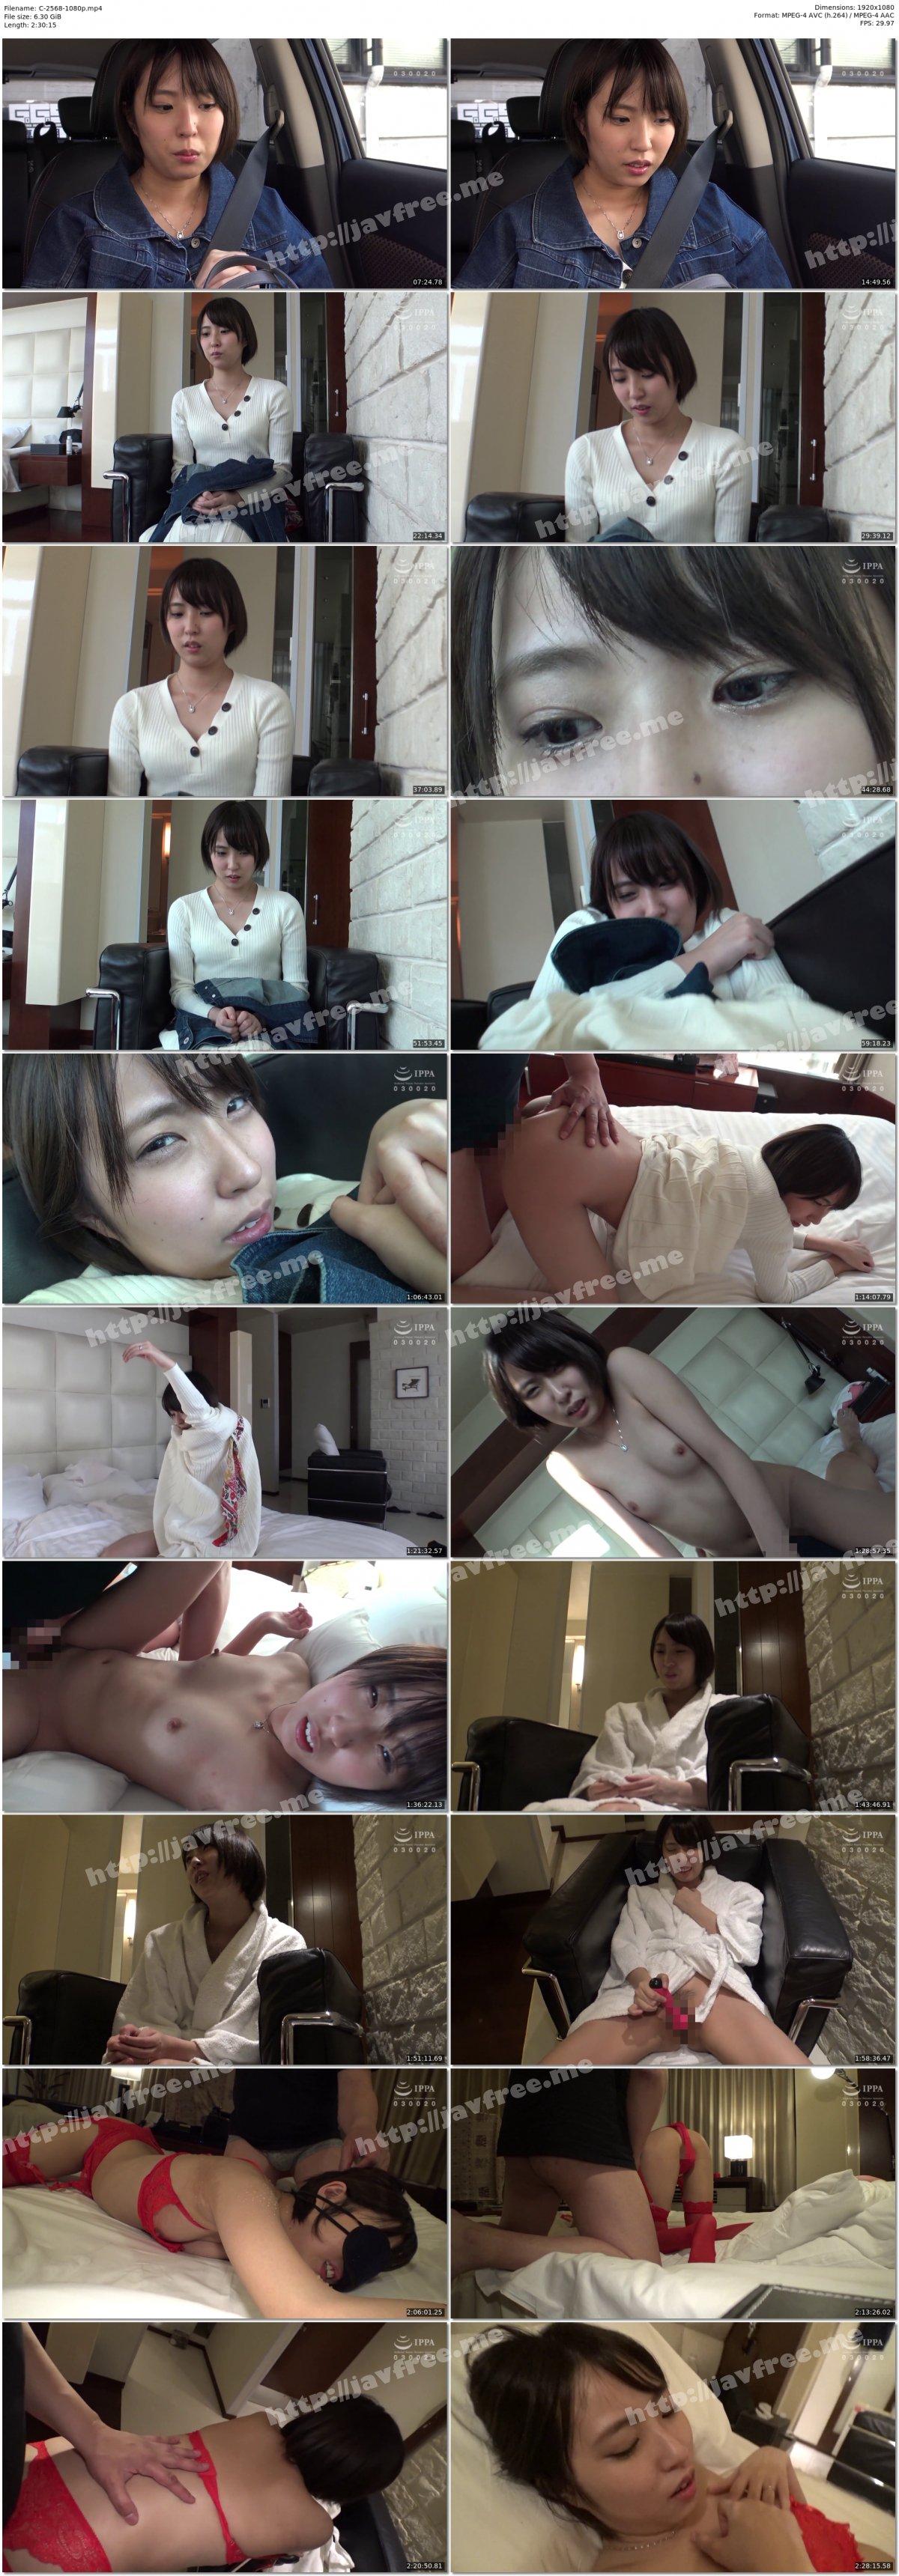 [HD][C-2568] うちの妻・E美(25歳)を寝取ってください88 - image C-2568-1080p on https://javfree.me